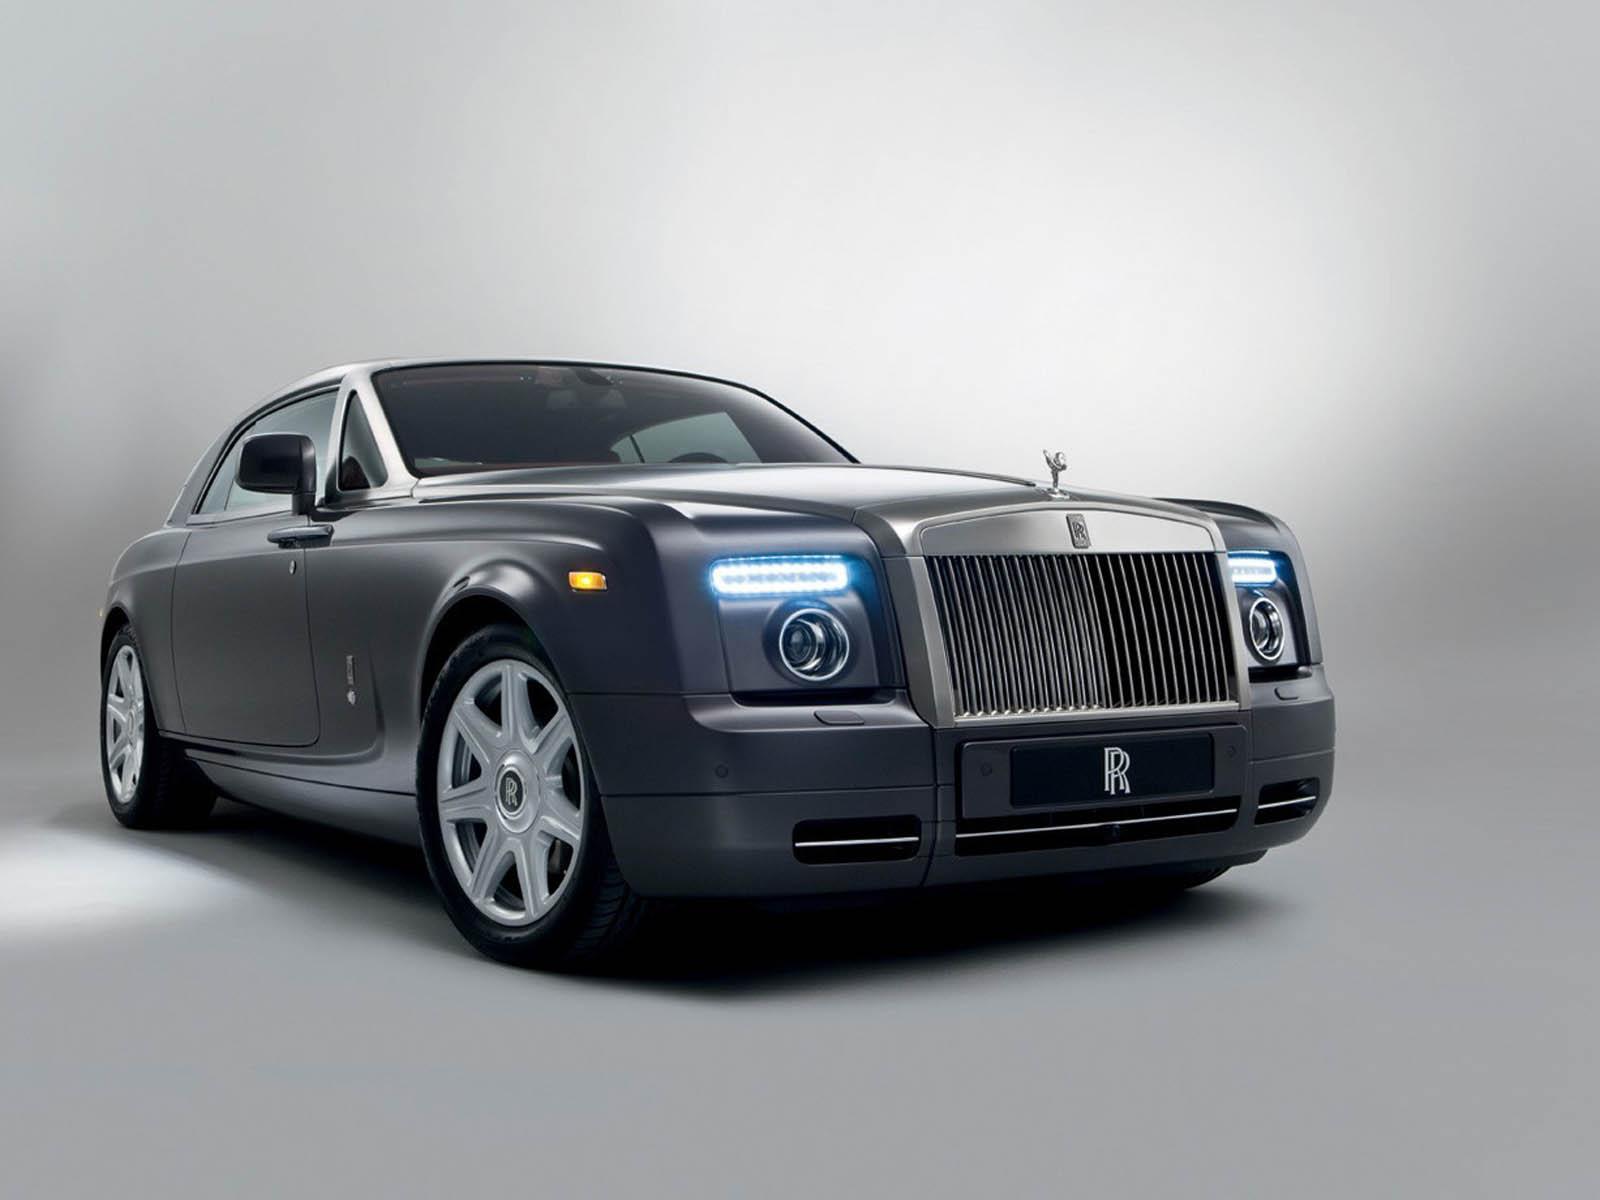 Wallpaper Rolls Royce Phantom Coupe Car Wallpapers